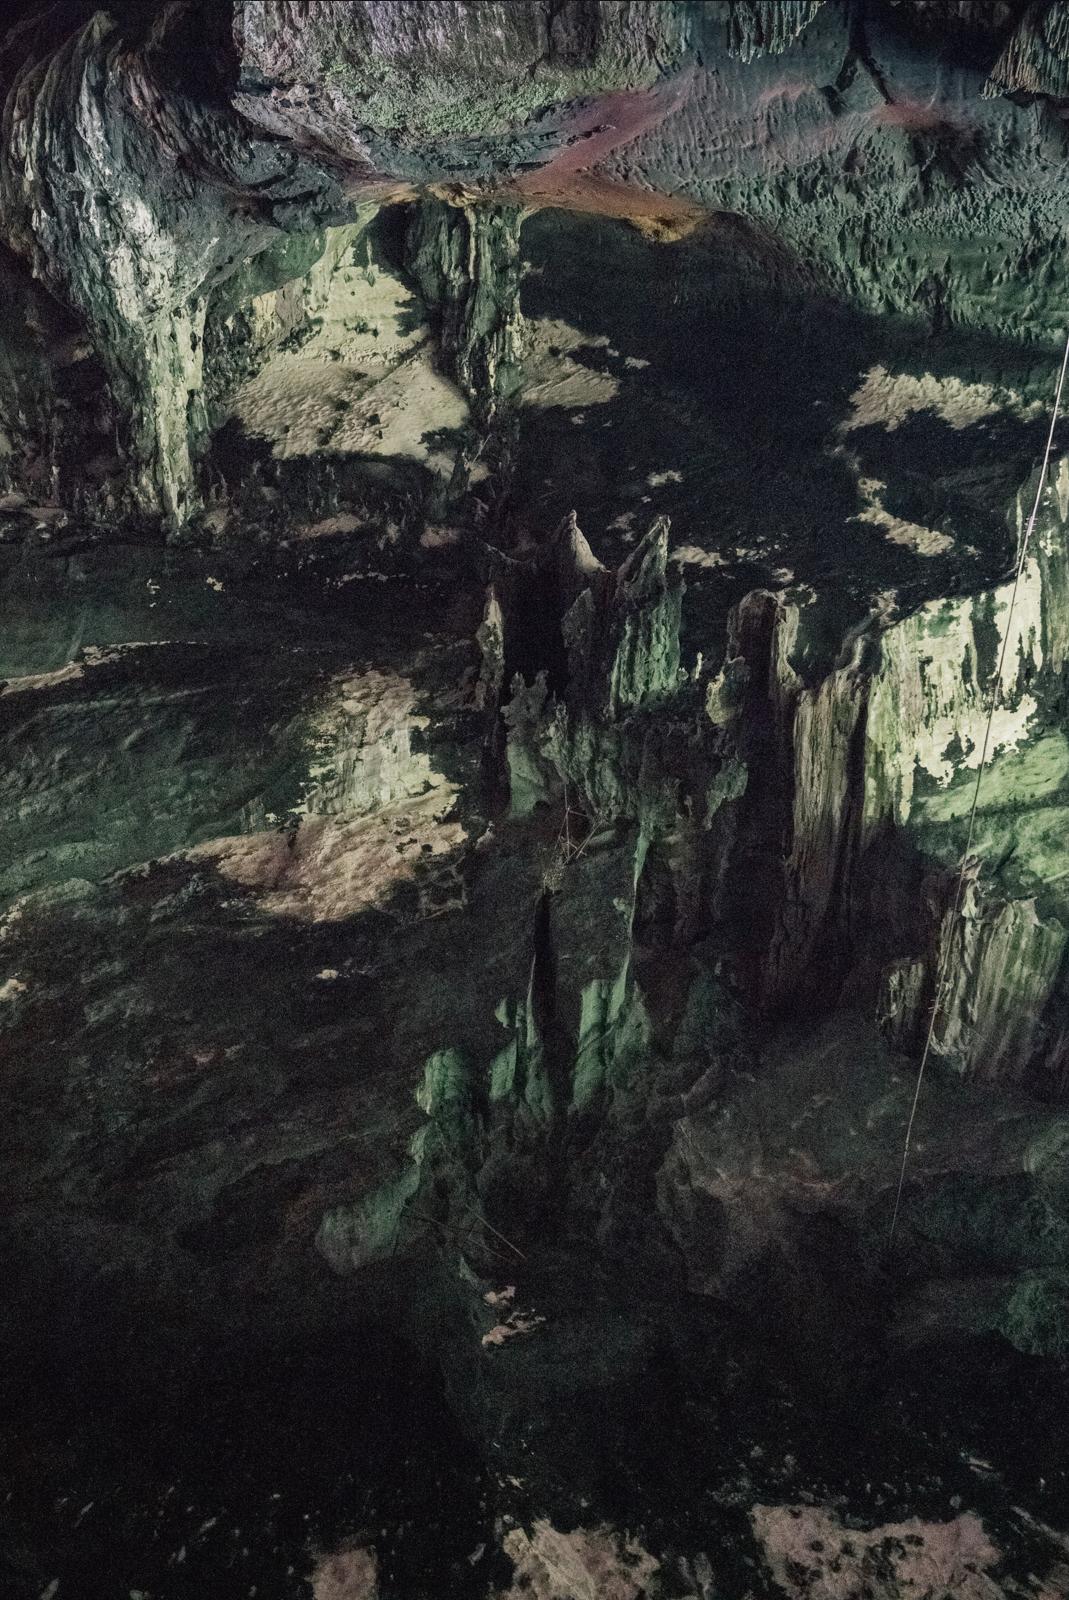 mulu caves bat caves sarawak green alien